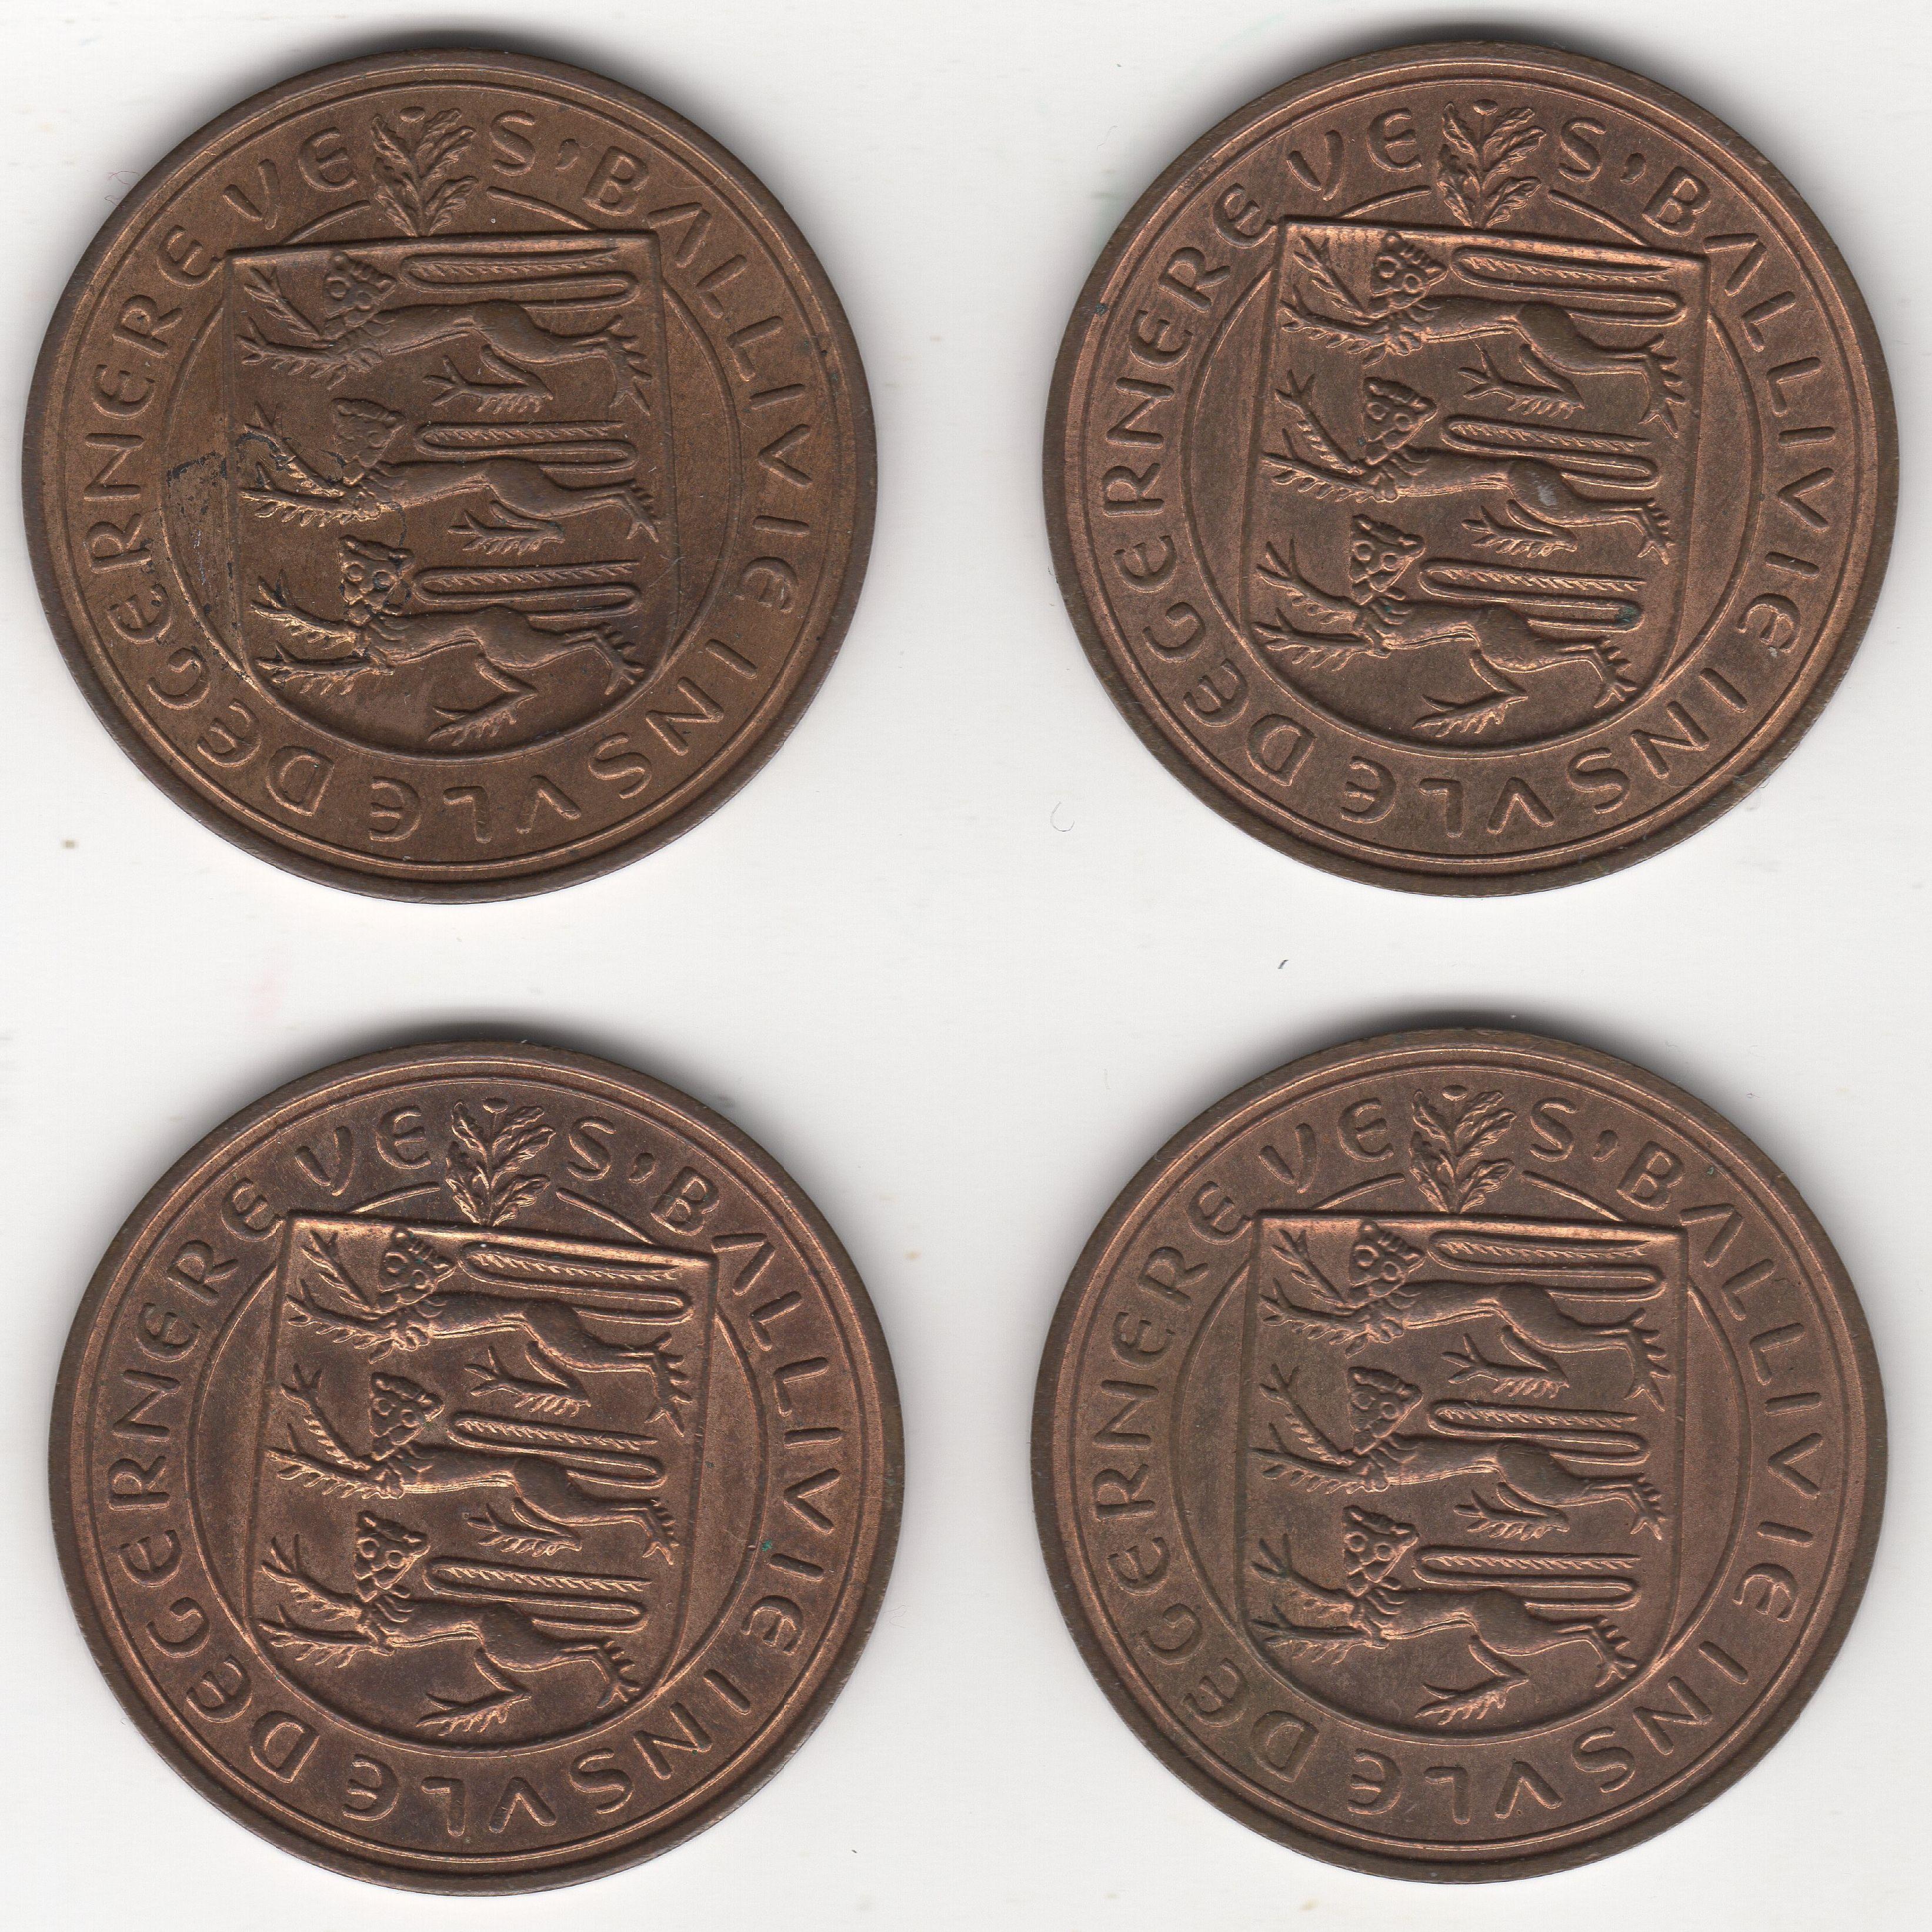 1959 Guernsey 8 Doubles Coins Bulk Coins Pennies2pounds